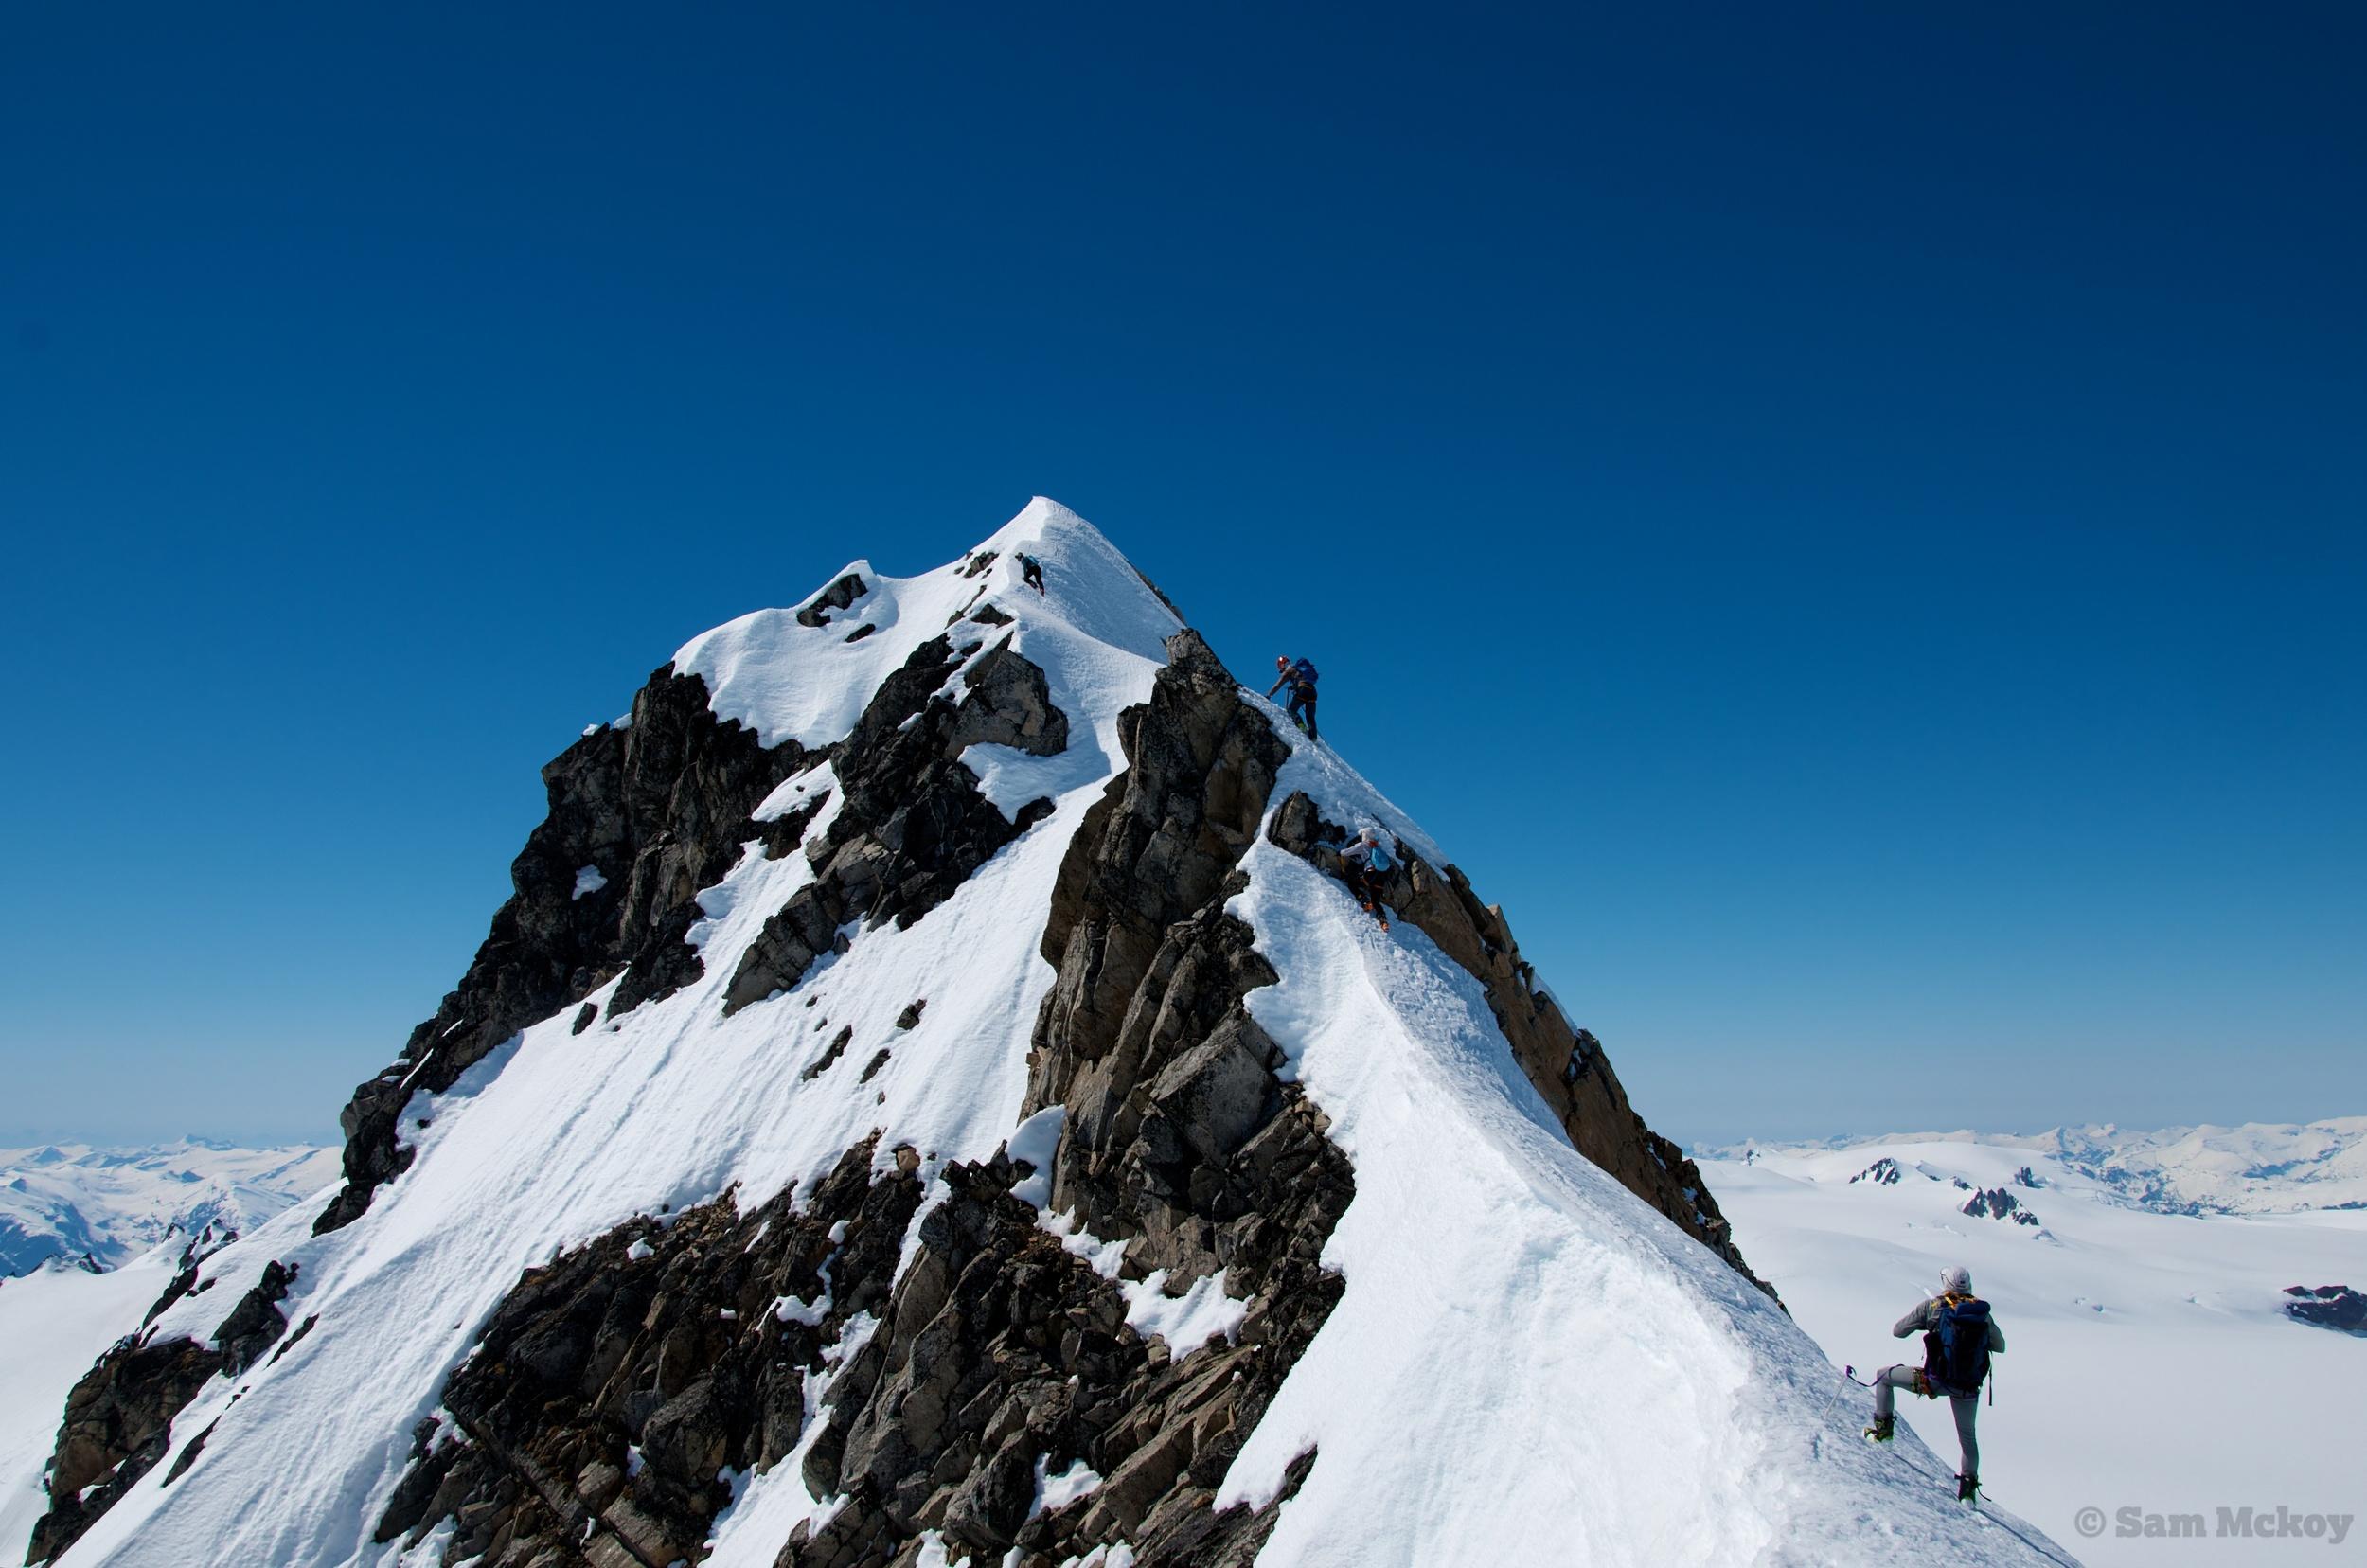 The group ascending the summit ridge of Somolenko.